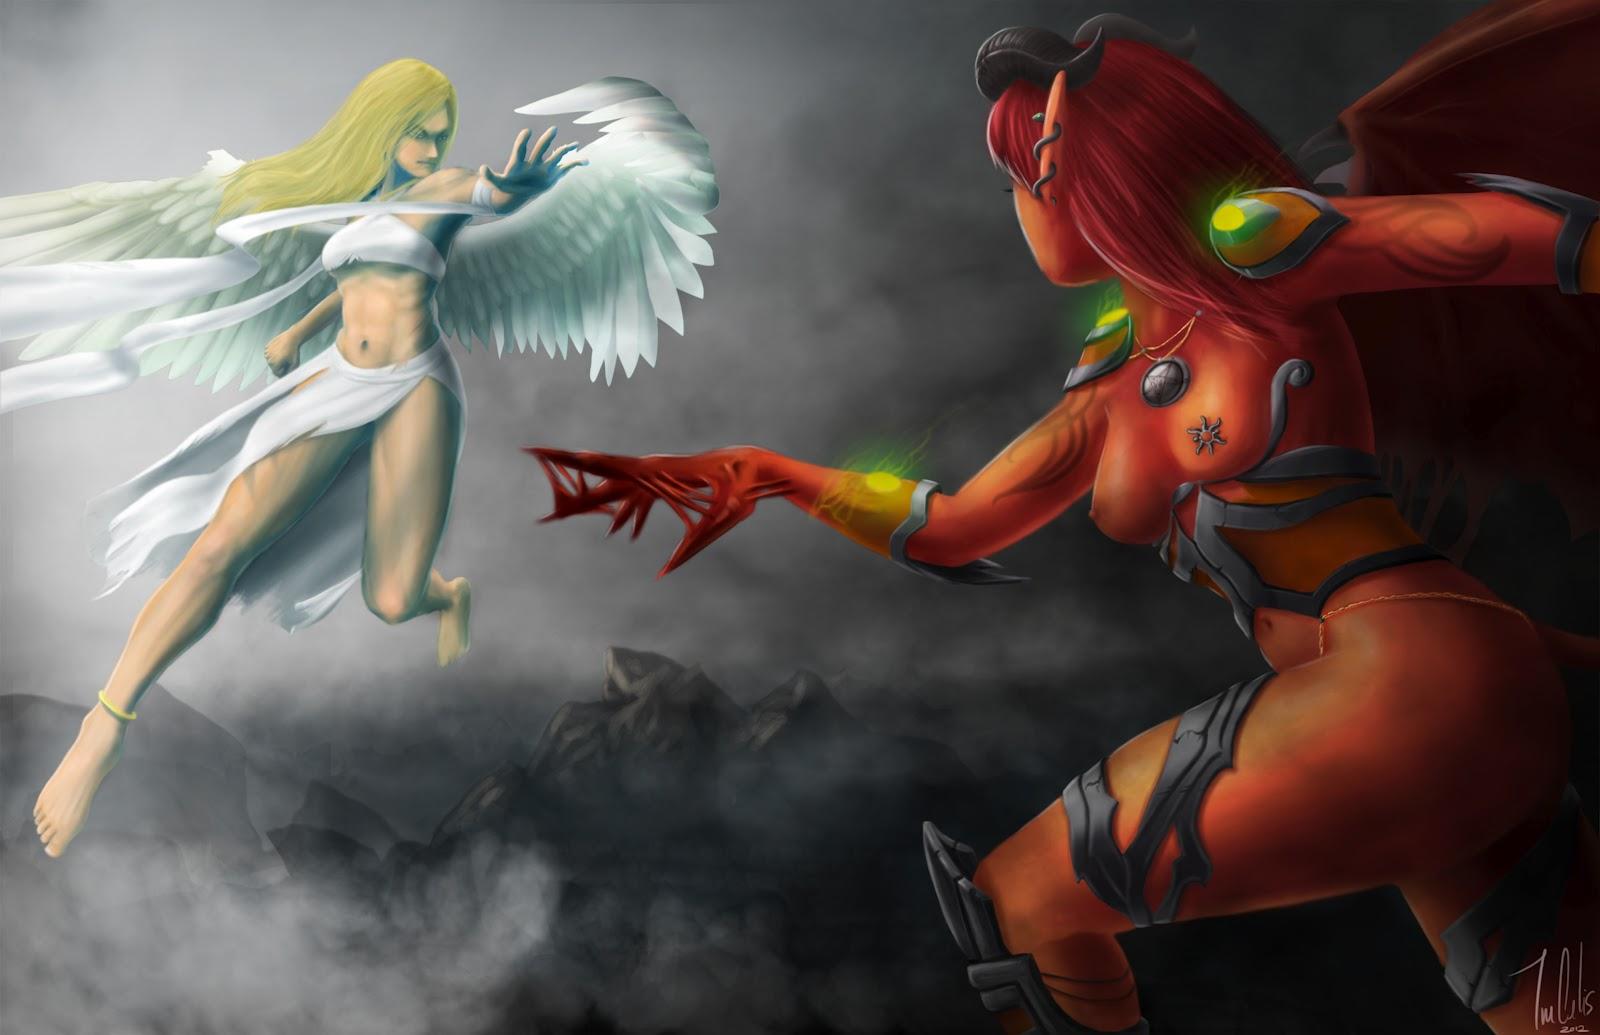 140 best images about Angels vs demons on Pinterest ...